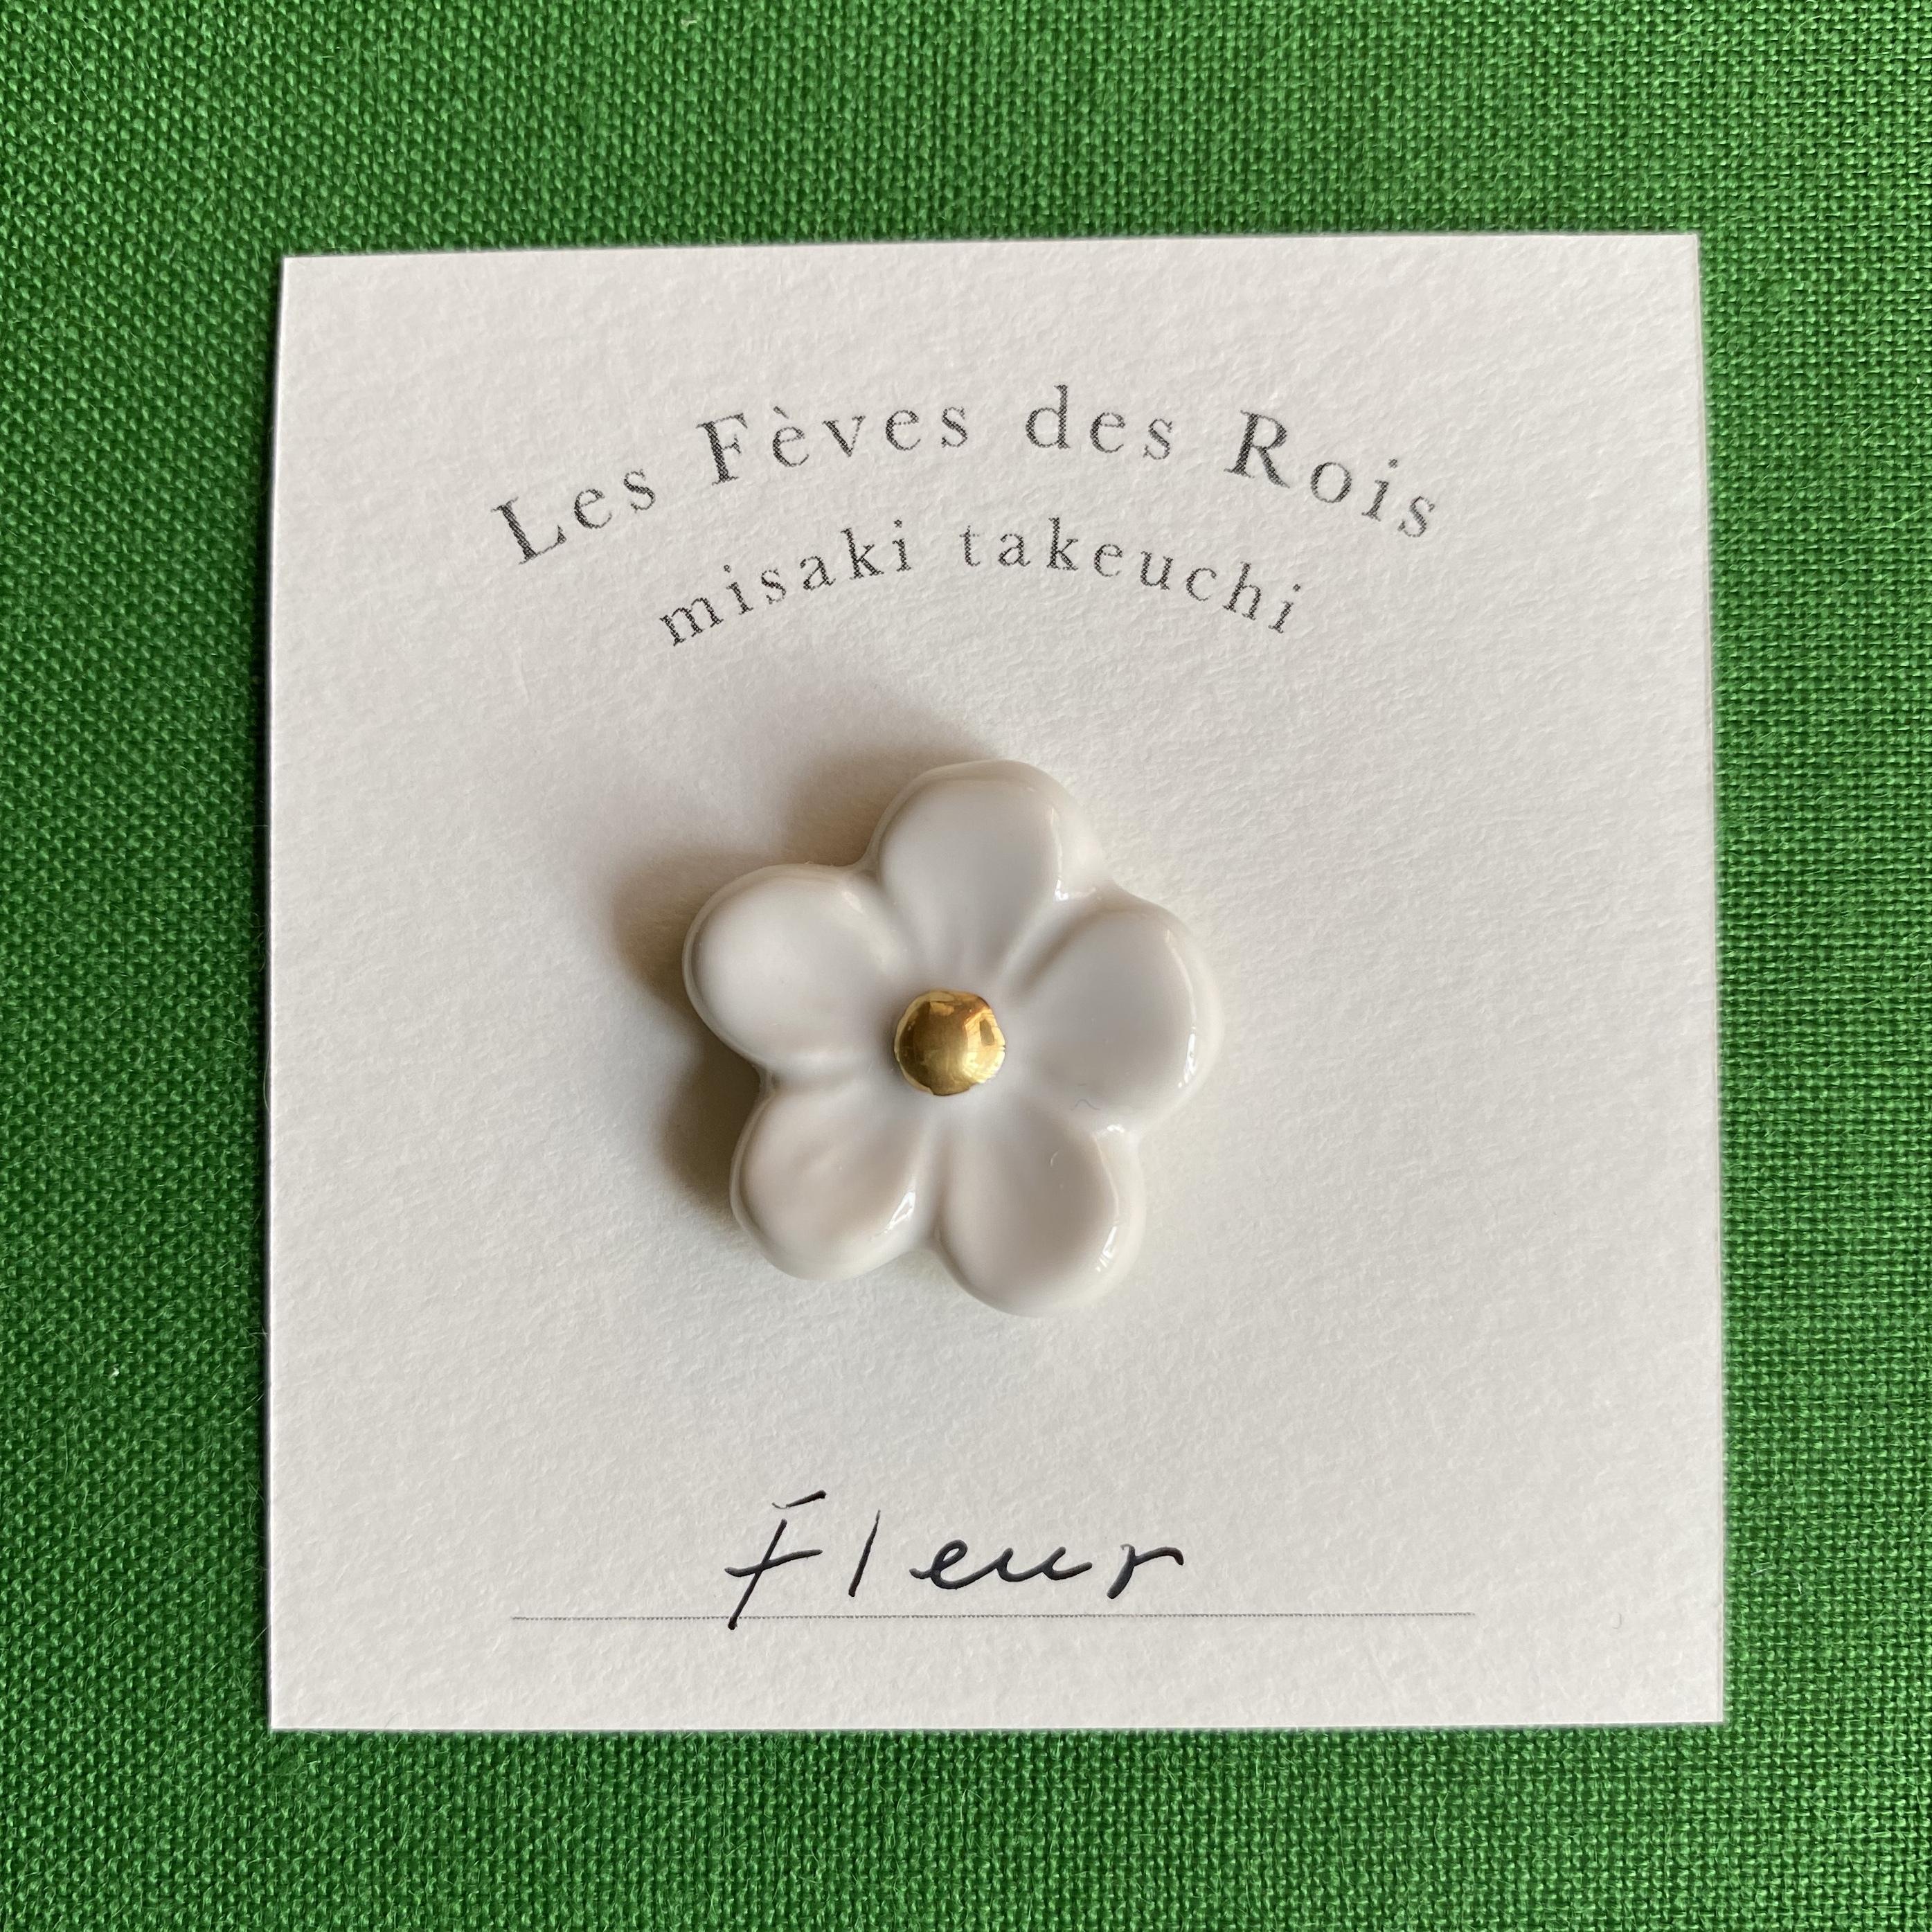 fleur (花)misaki takeuchi ハンドメイドフェーヴ/mt029